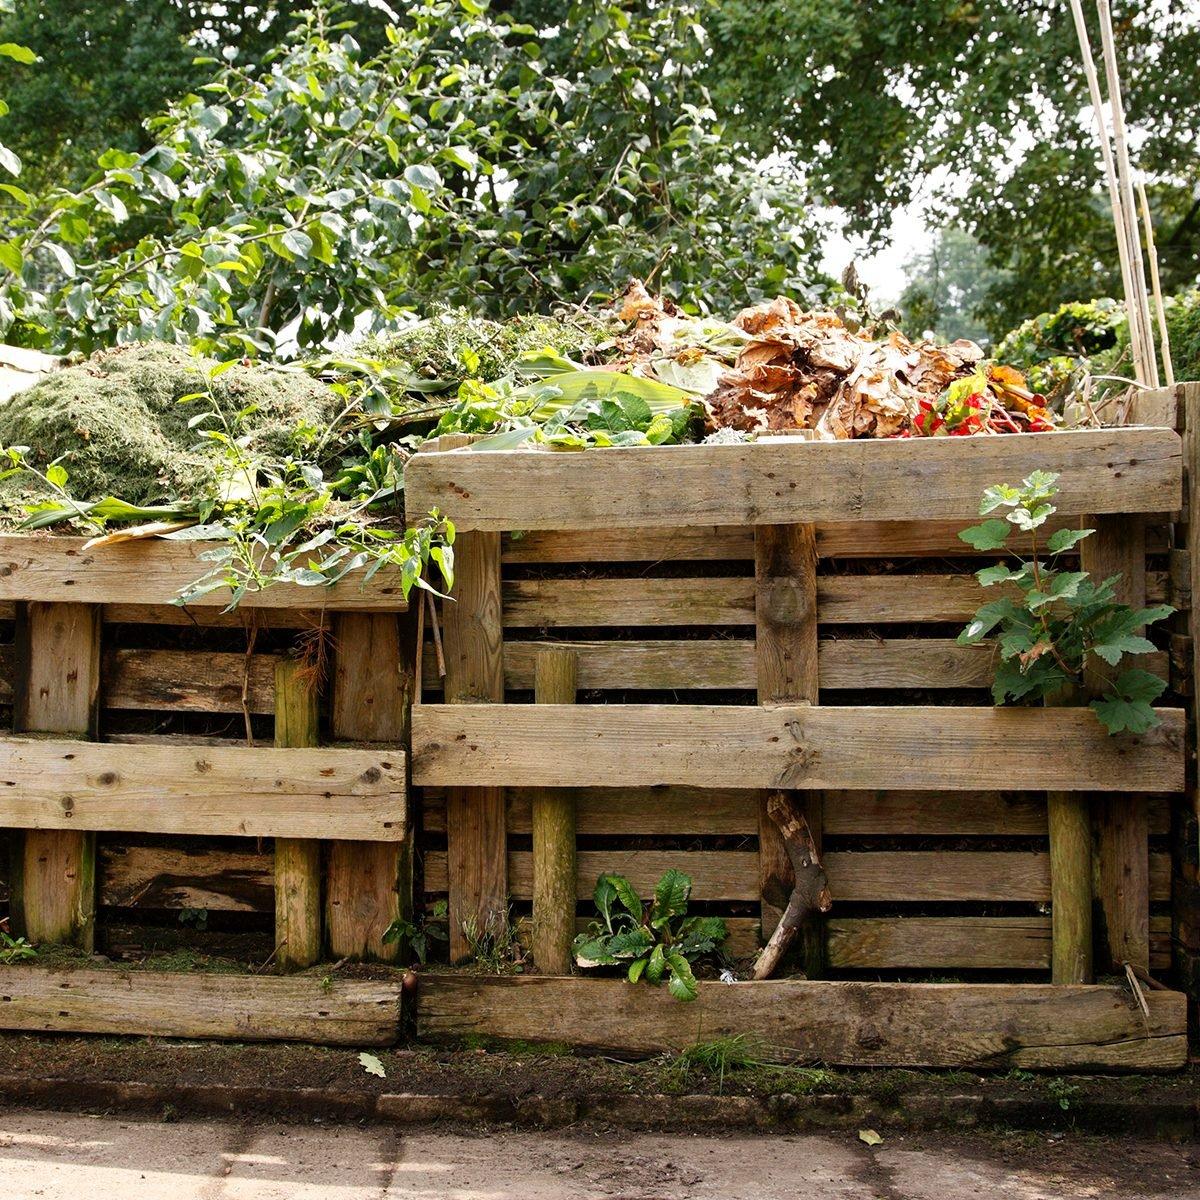 wooden compost bin kings heath park birmingham west midlands uk